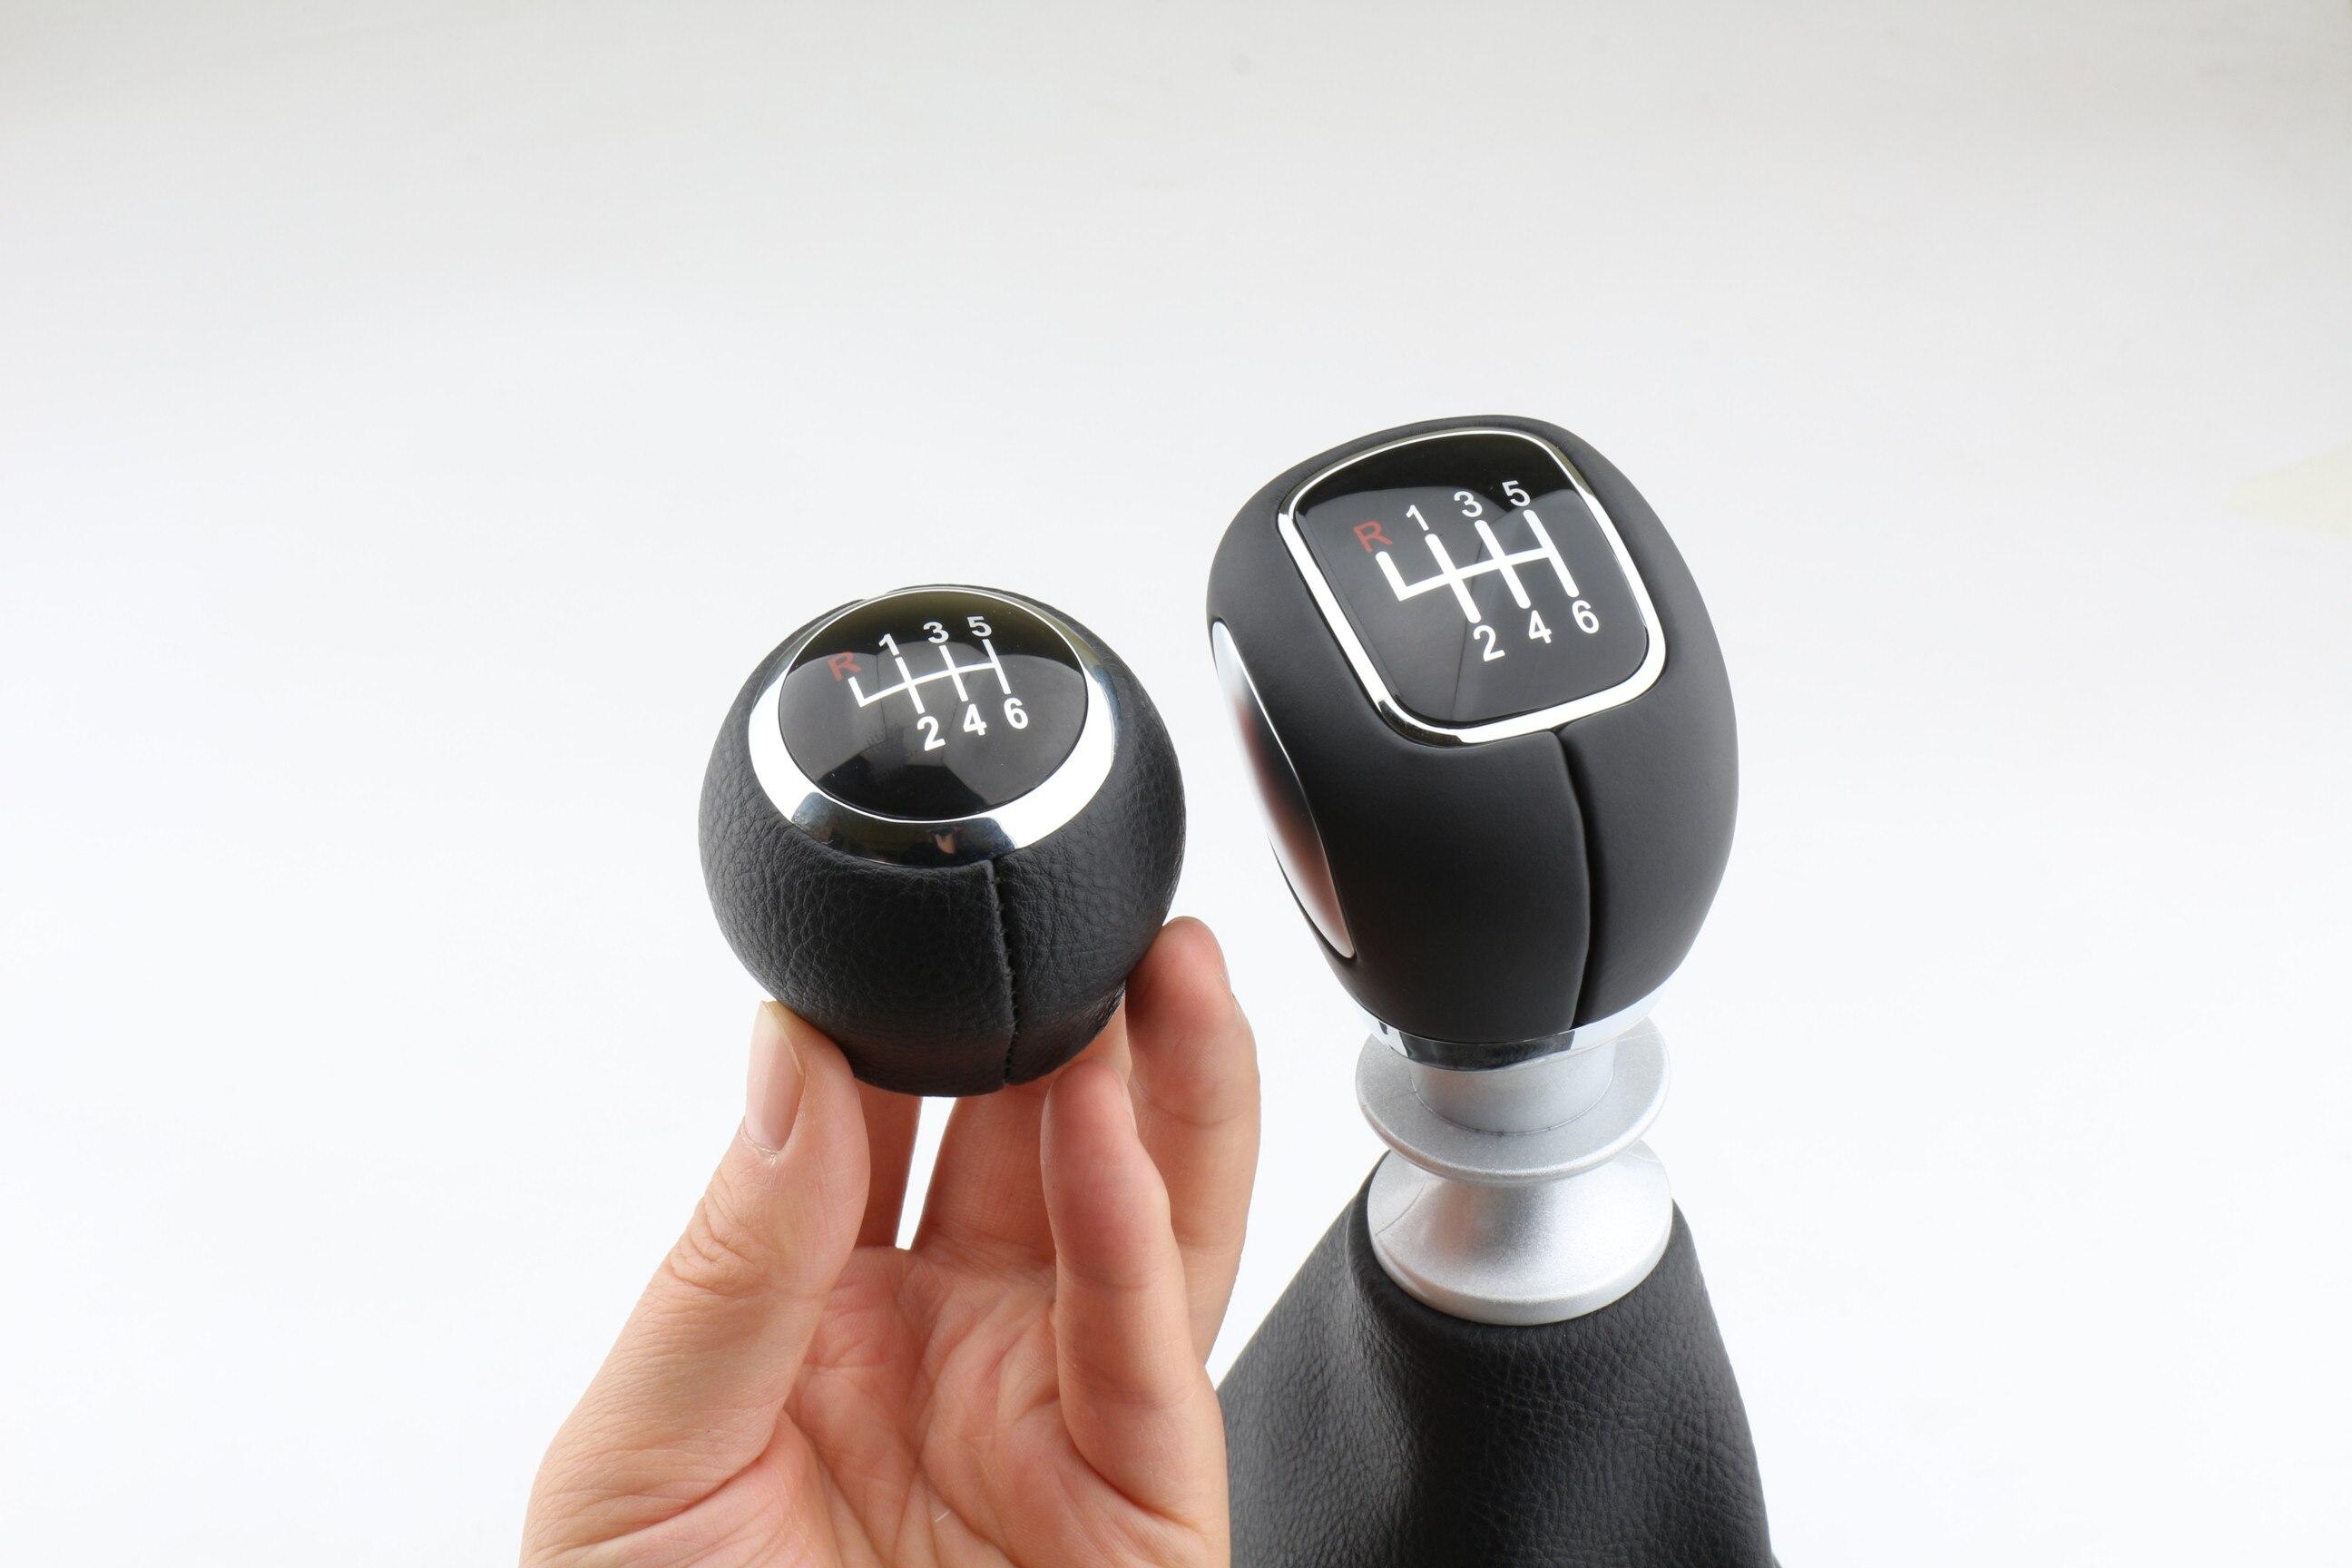 Para Chevrolet Cruze 2009 2010 2011 2012 2013 2014 2015 cuero, para palanca de transmisión manual de 5 velocidades